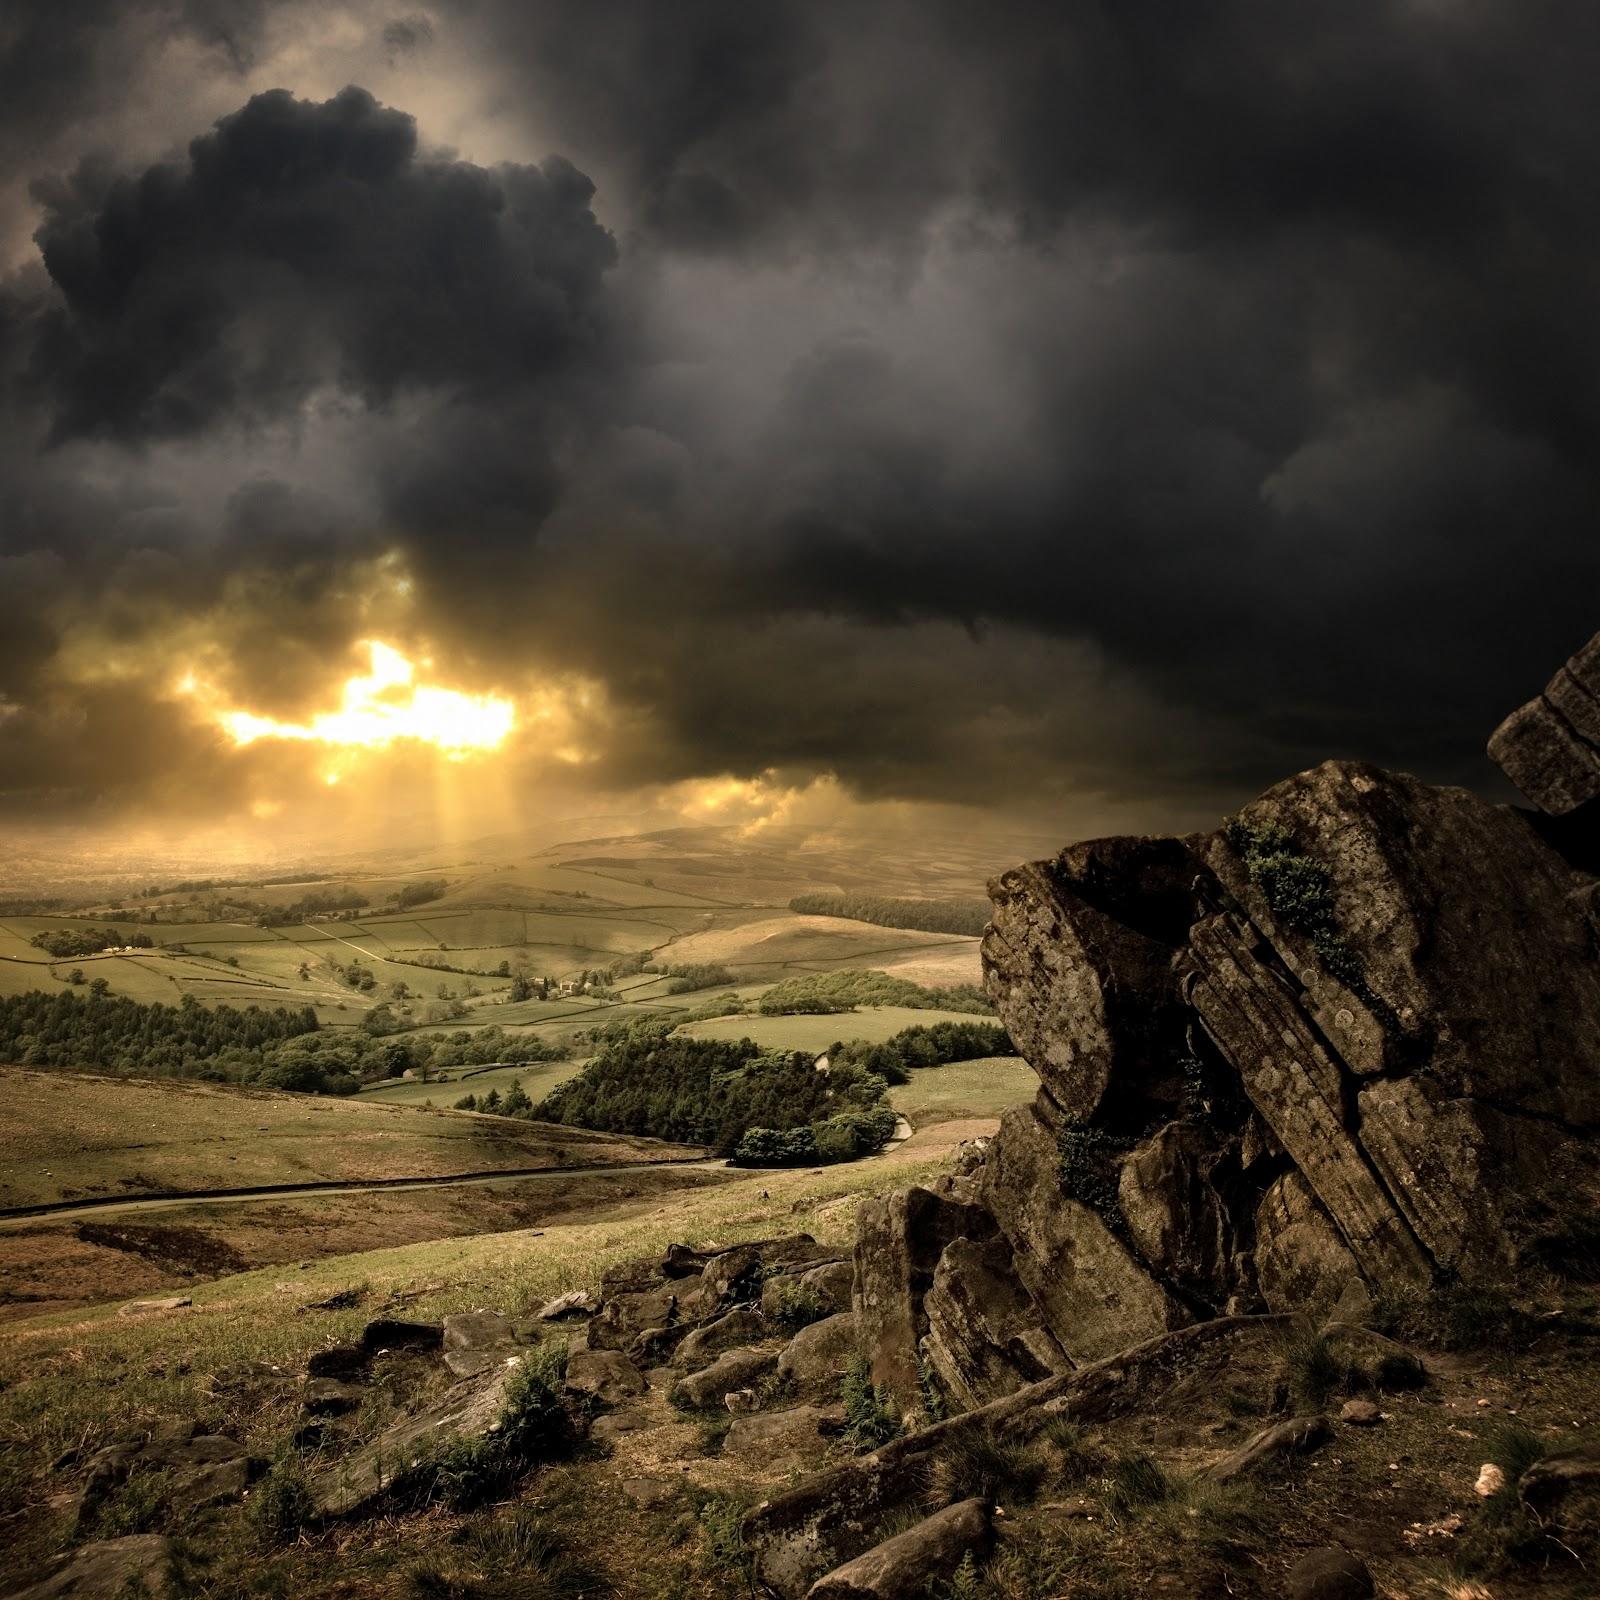 Nature Shutterstock